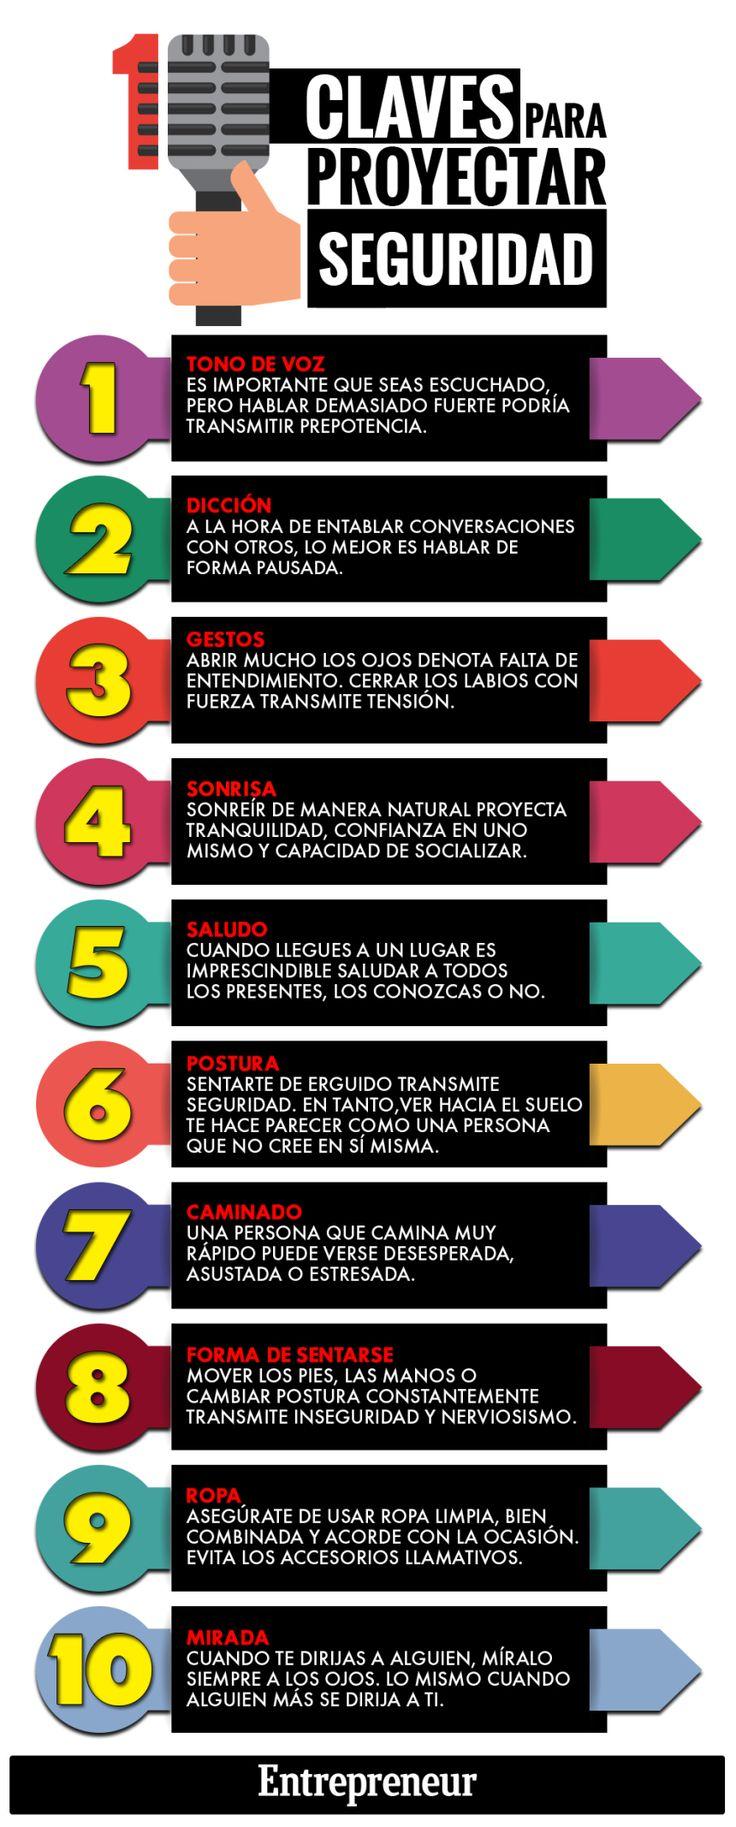 10 FORMAS DE PROYECTAR SEGURIDAD EN TI MISMO #INFOGRAFIA #INFOGRAPHIC